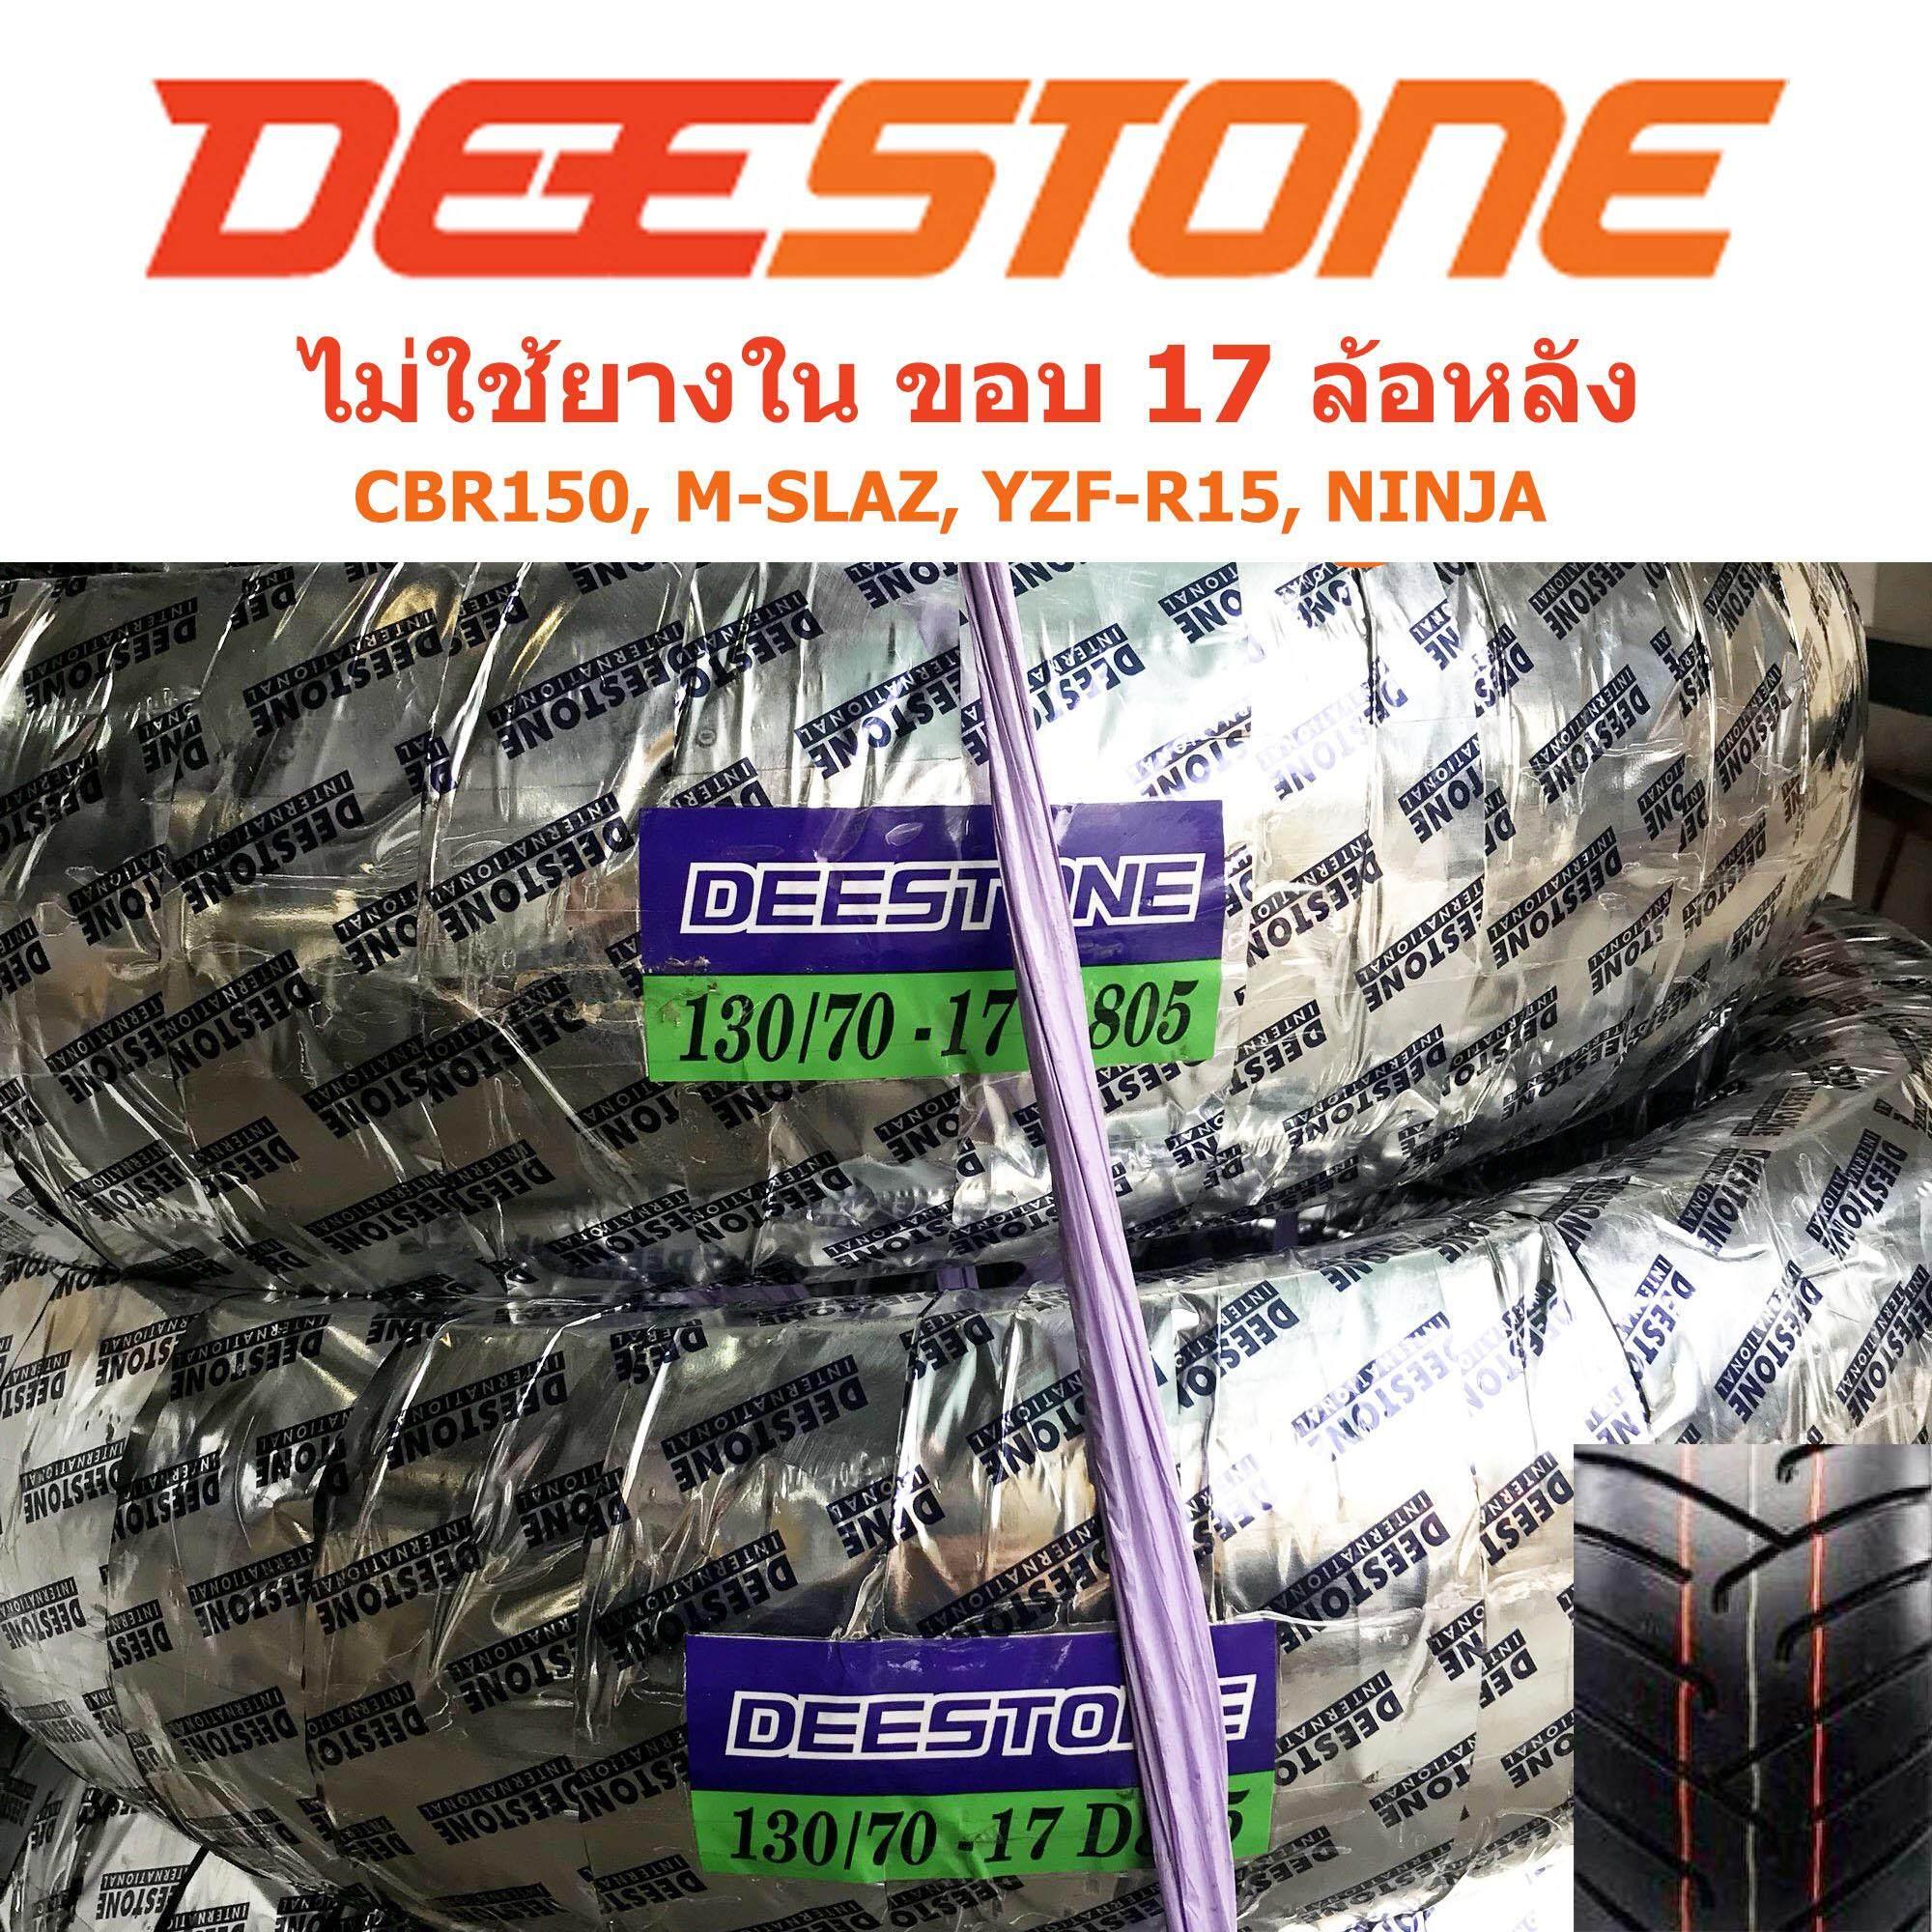 Deestone ดีสโตน ยางนอกไม่ต้องใช้ยางใน ขอบ 17 รุ่น D805 Tl 130/70-17 สำหรับ Cbr 150r, M-Slaz, R15, Ninja, Gpx Cr5 (ล้อหลัง) 1 เส้น.